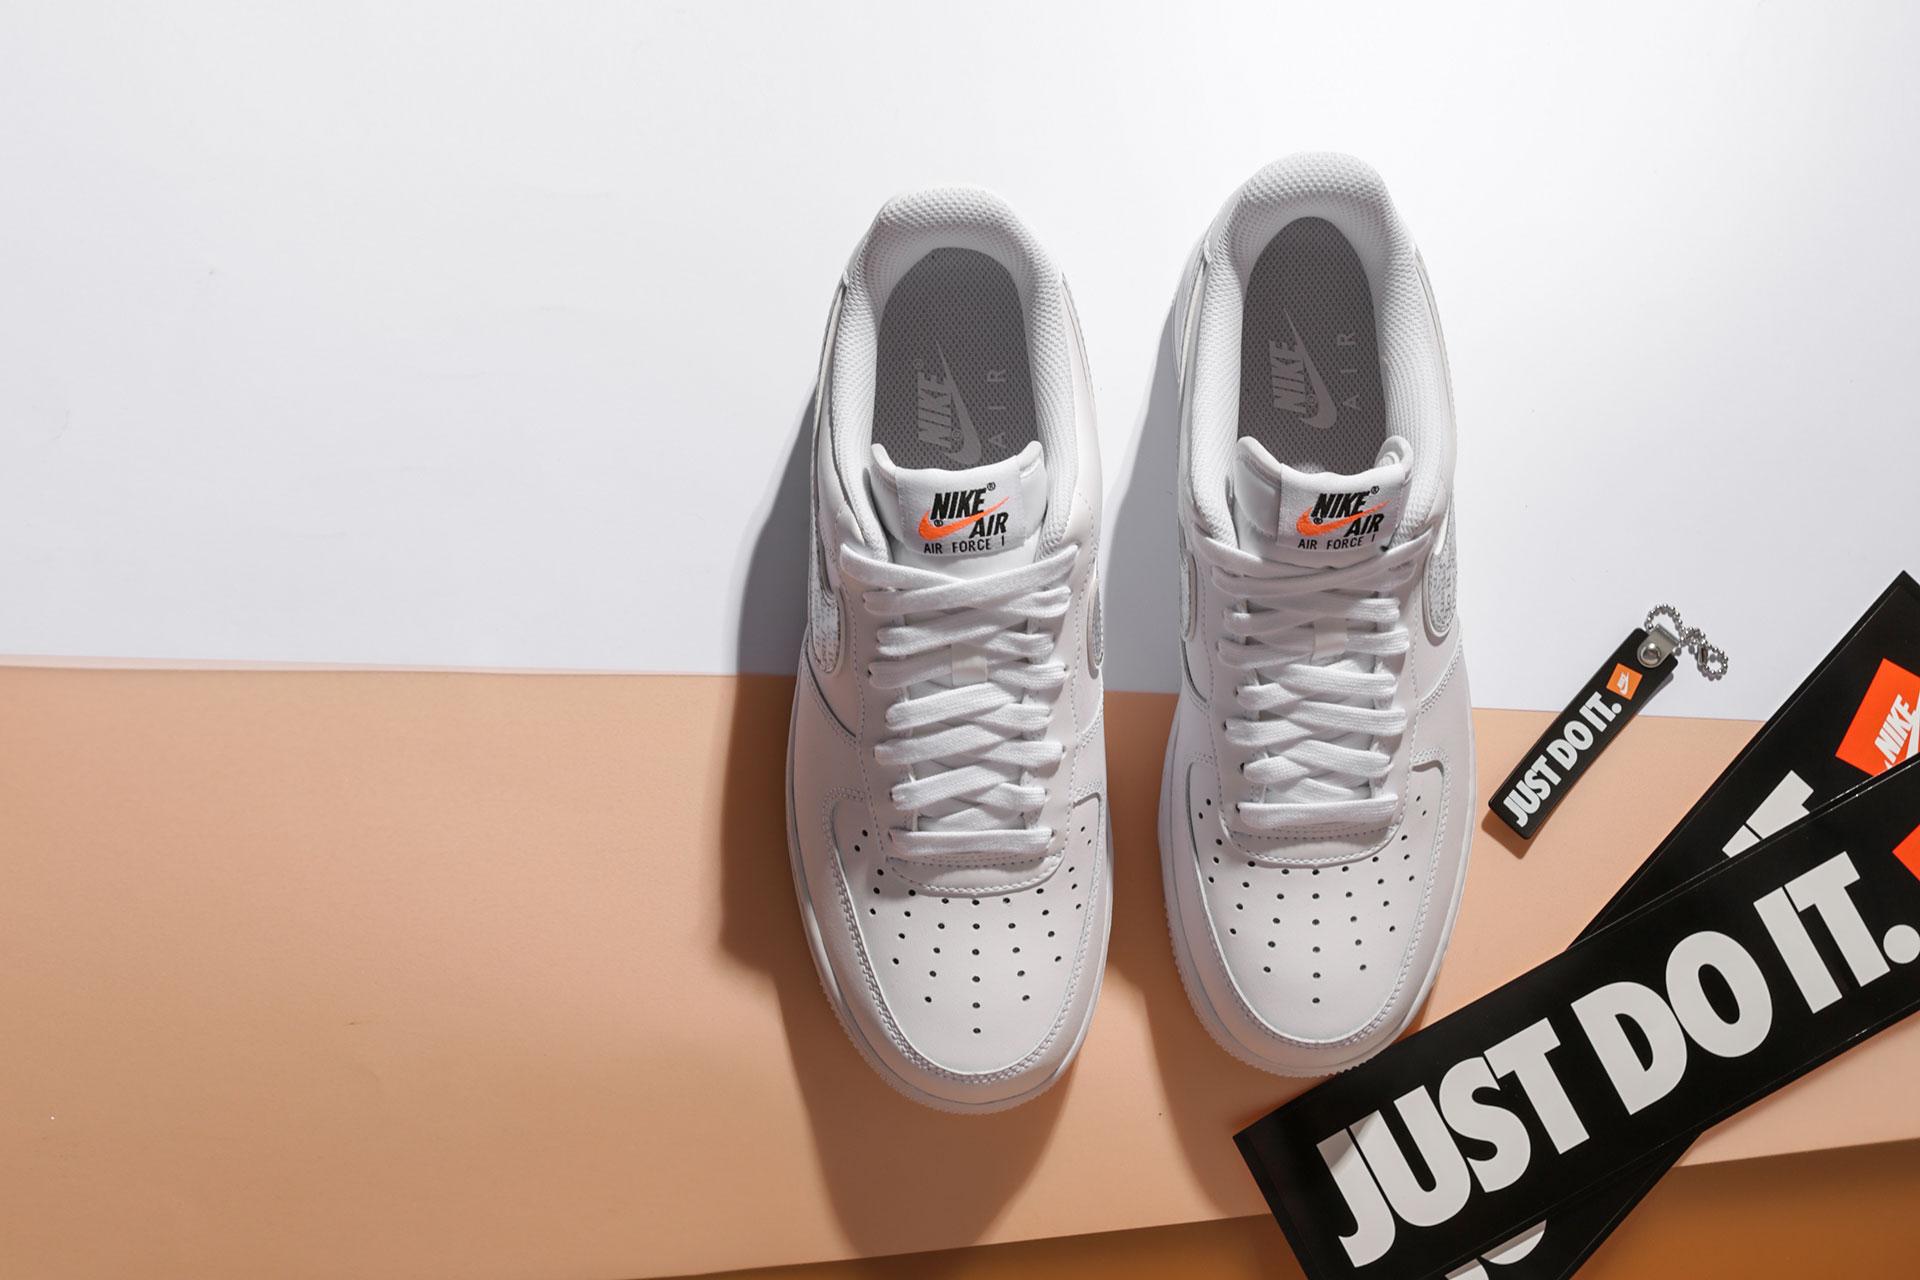 90120e0a ... Купить мужские белые кроссовки Nike Air Force 1 '07 LV8 JDI LNTC - фото  3 ...